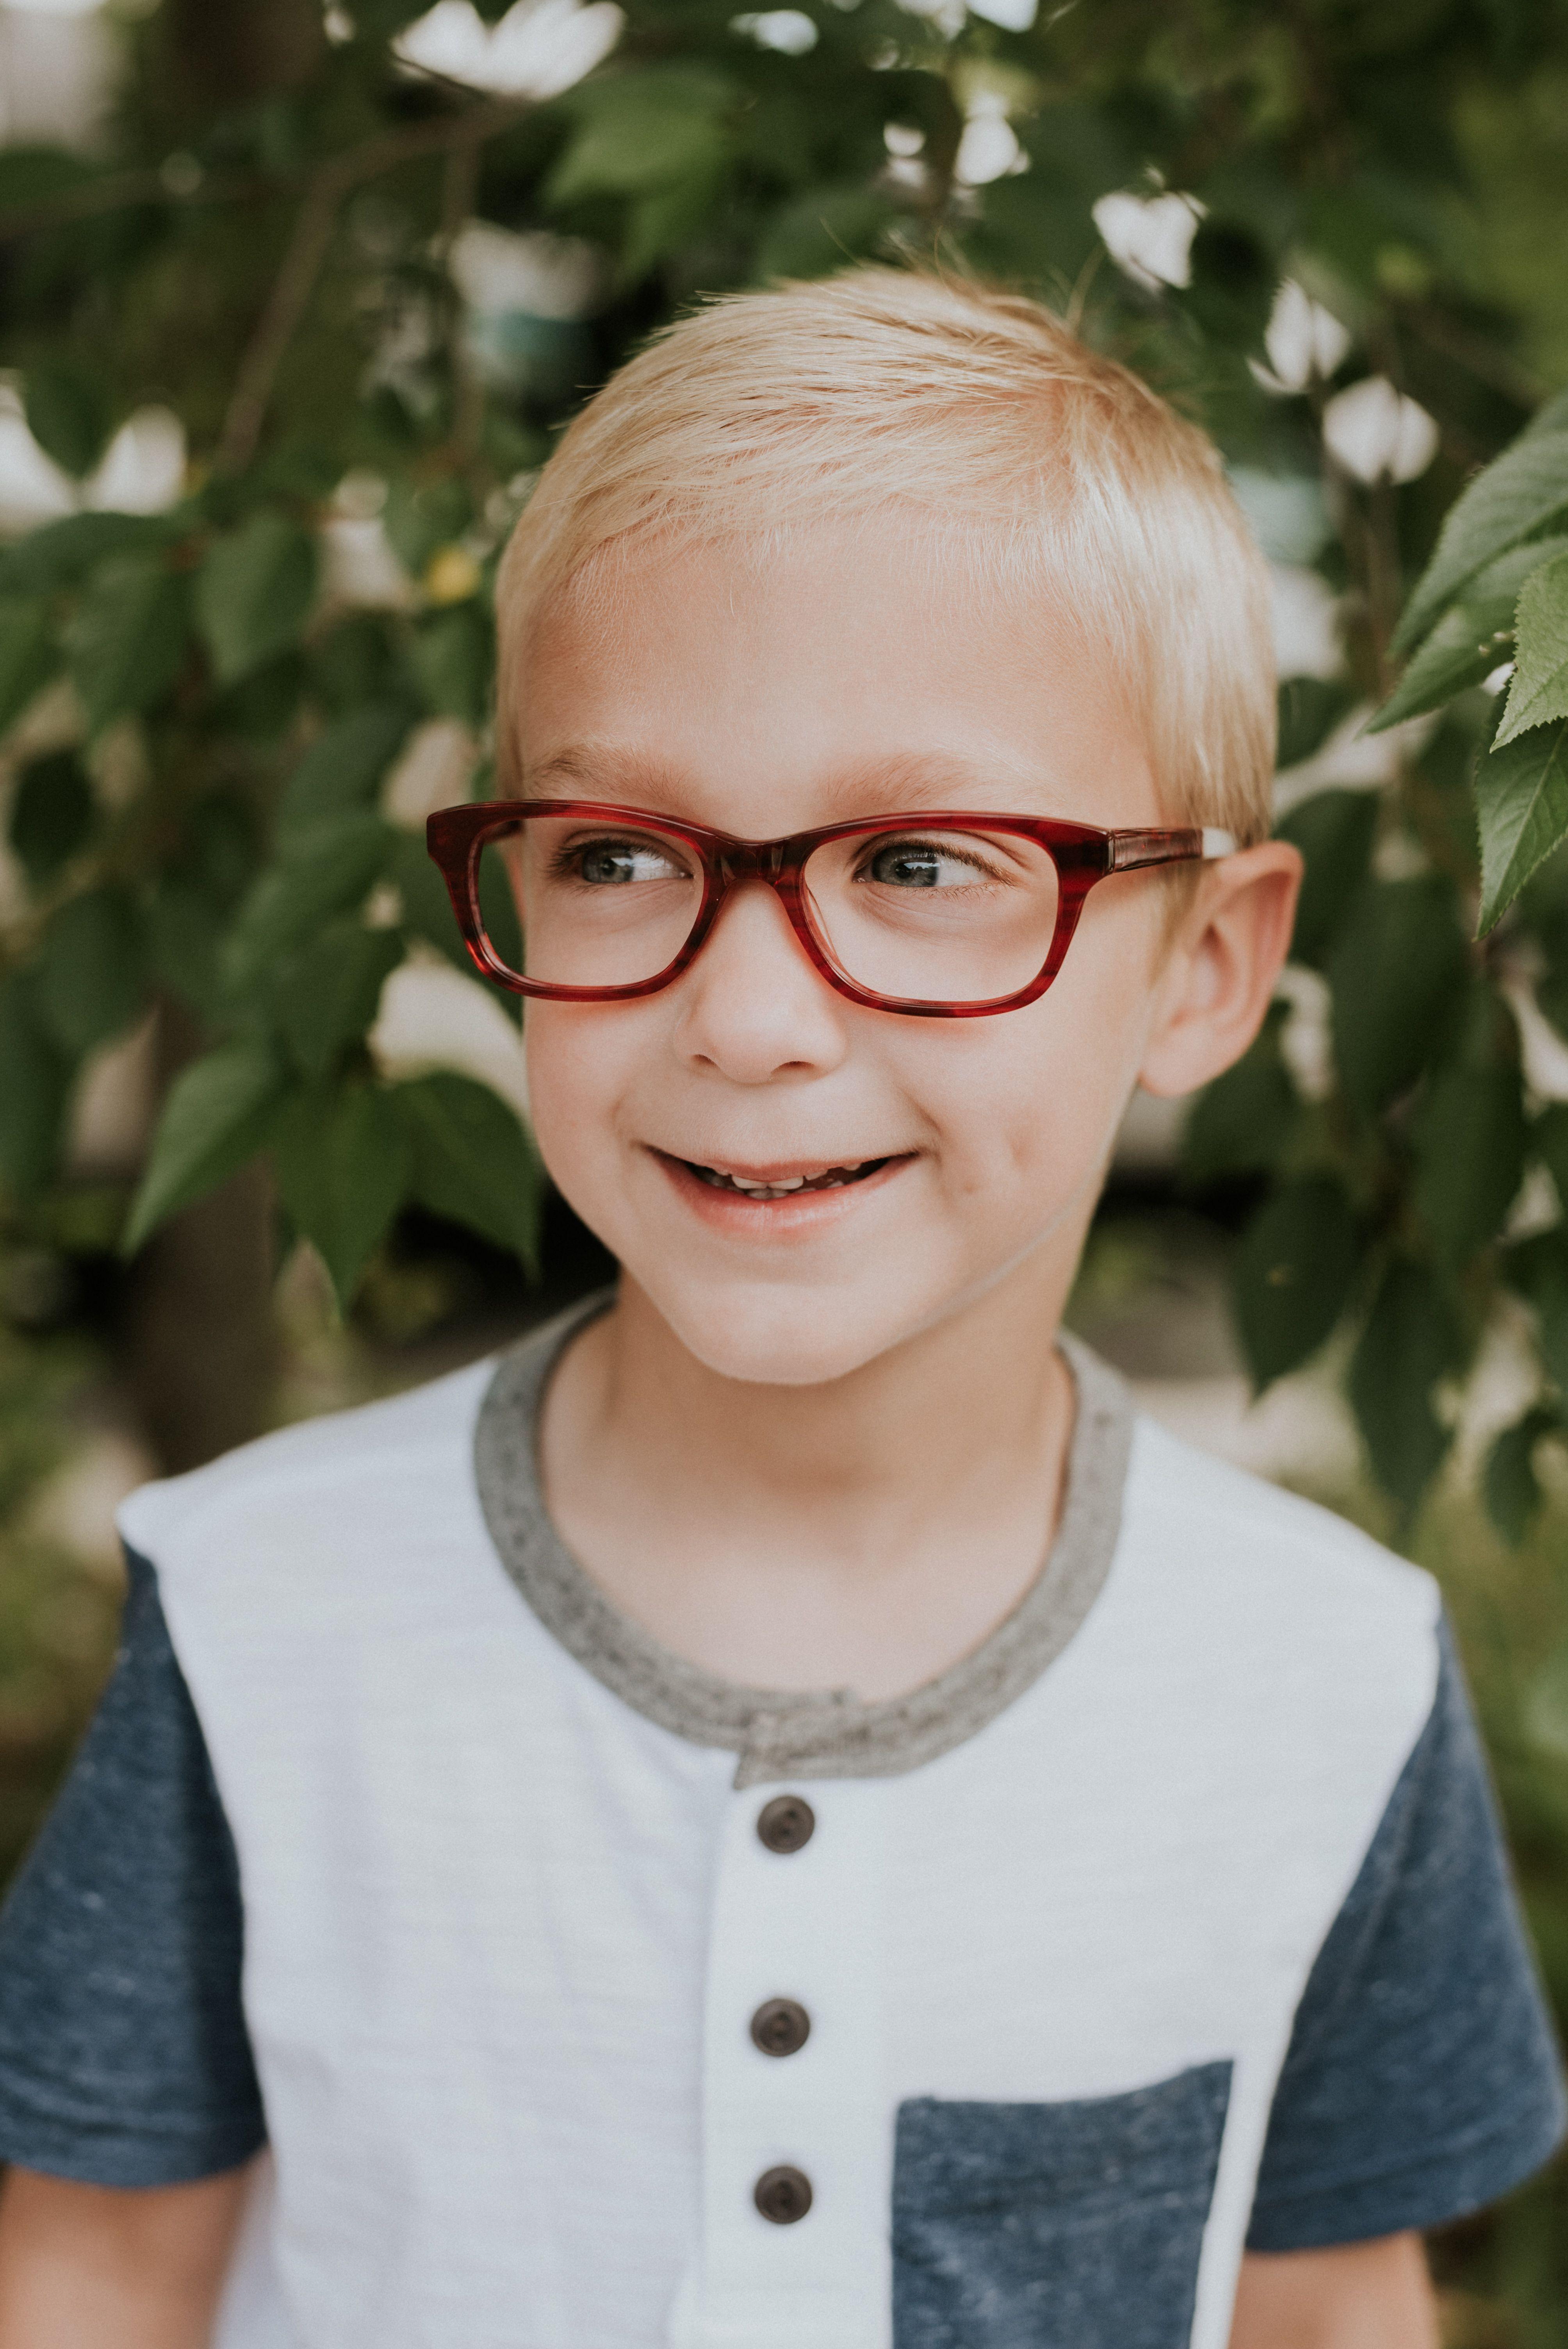 96ea38854f Red glasses for your little boy or girl child! Kids glasses with an impact      jonaspauleyewear  kidsglasses  childrenseyewear